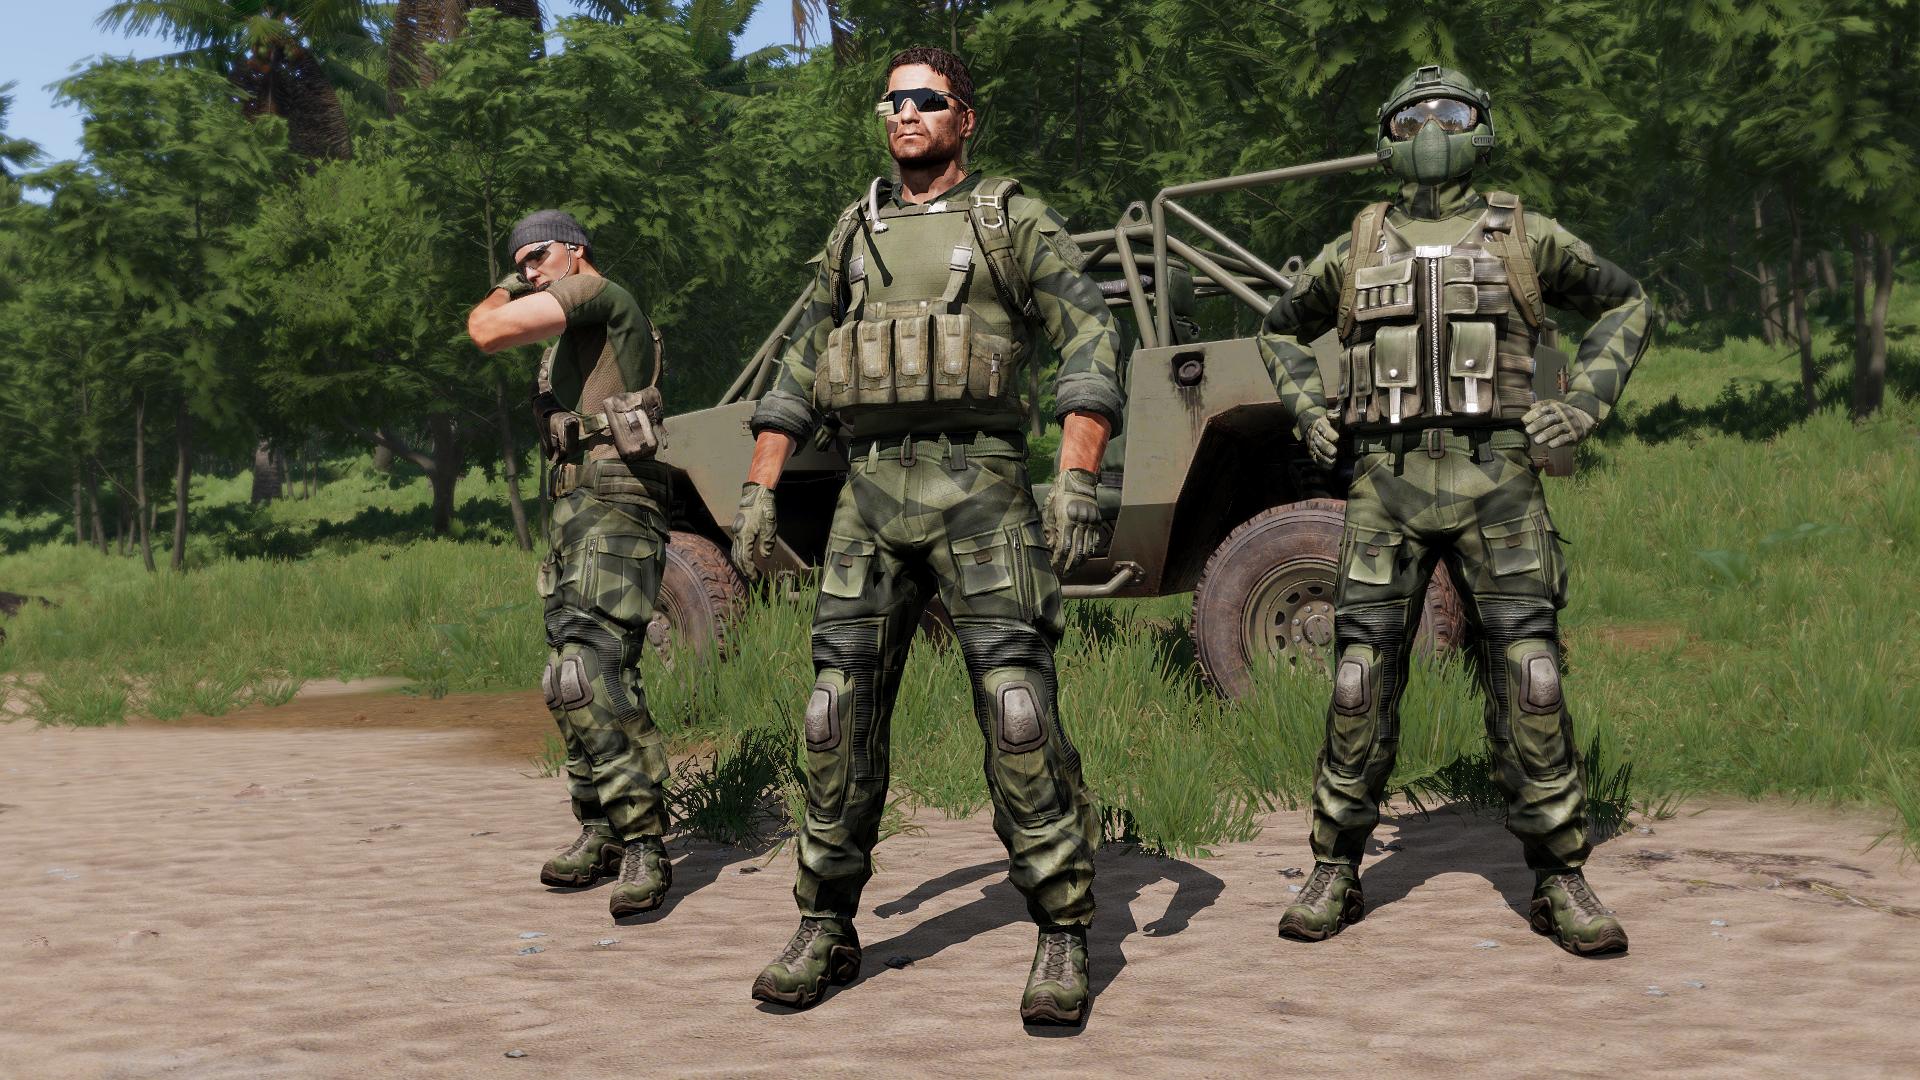 CTRG Stealth Uniform